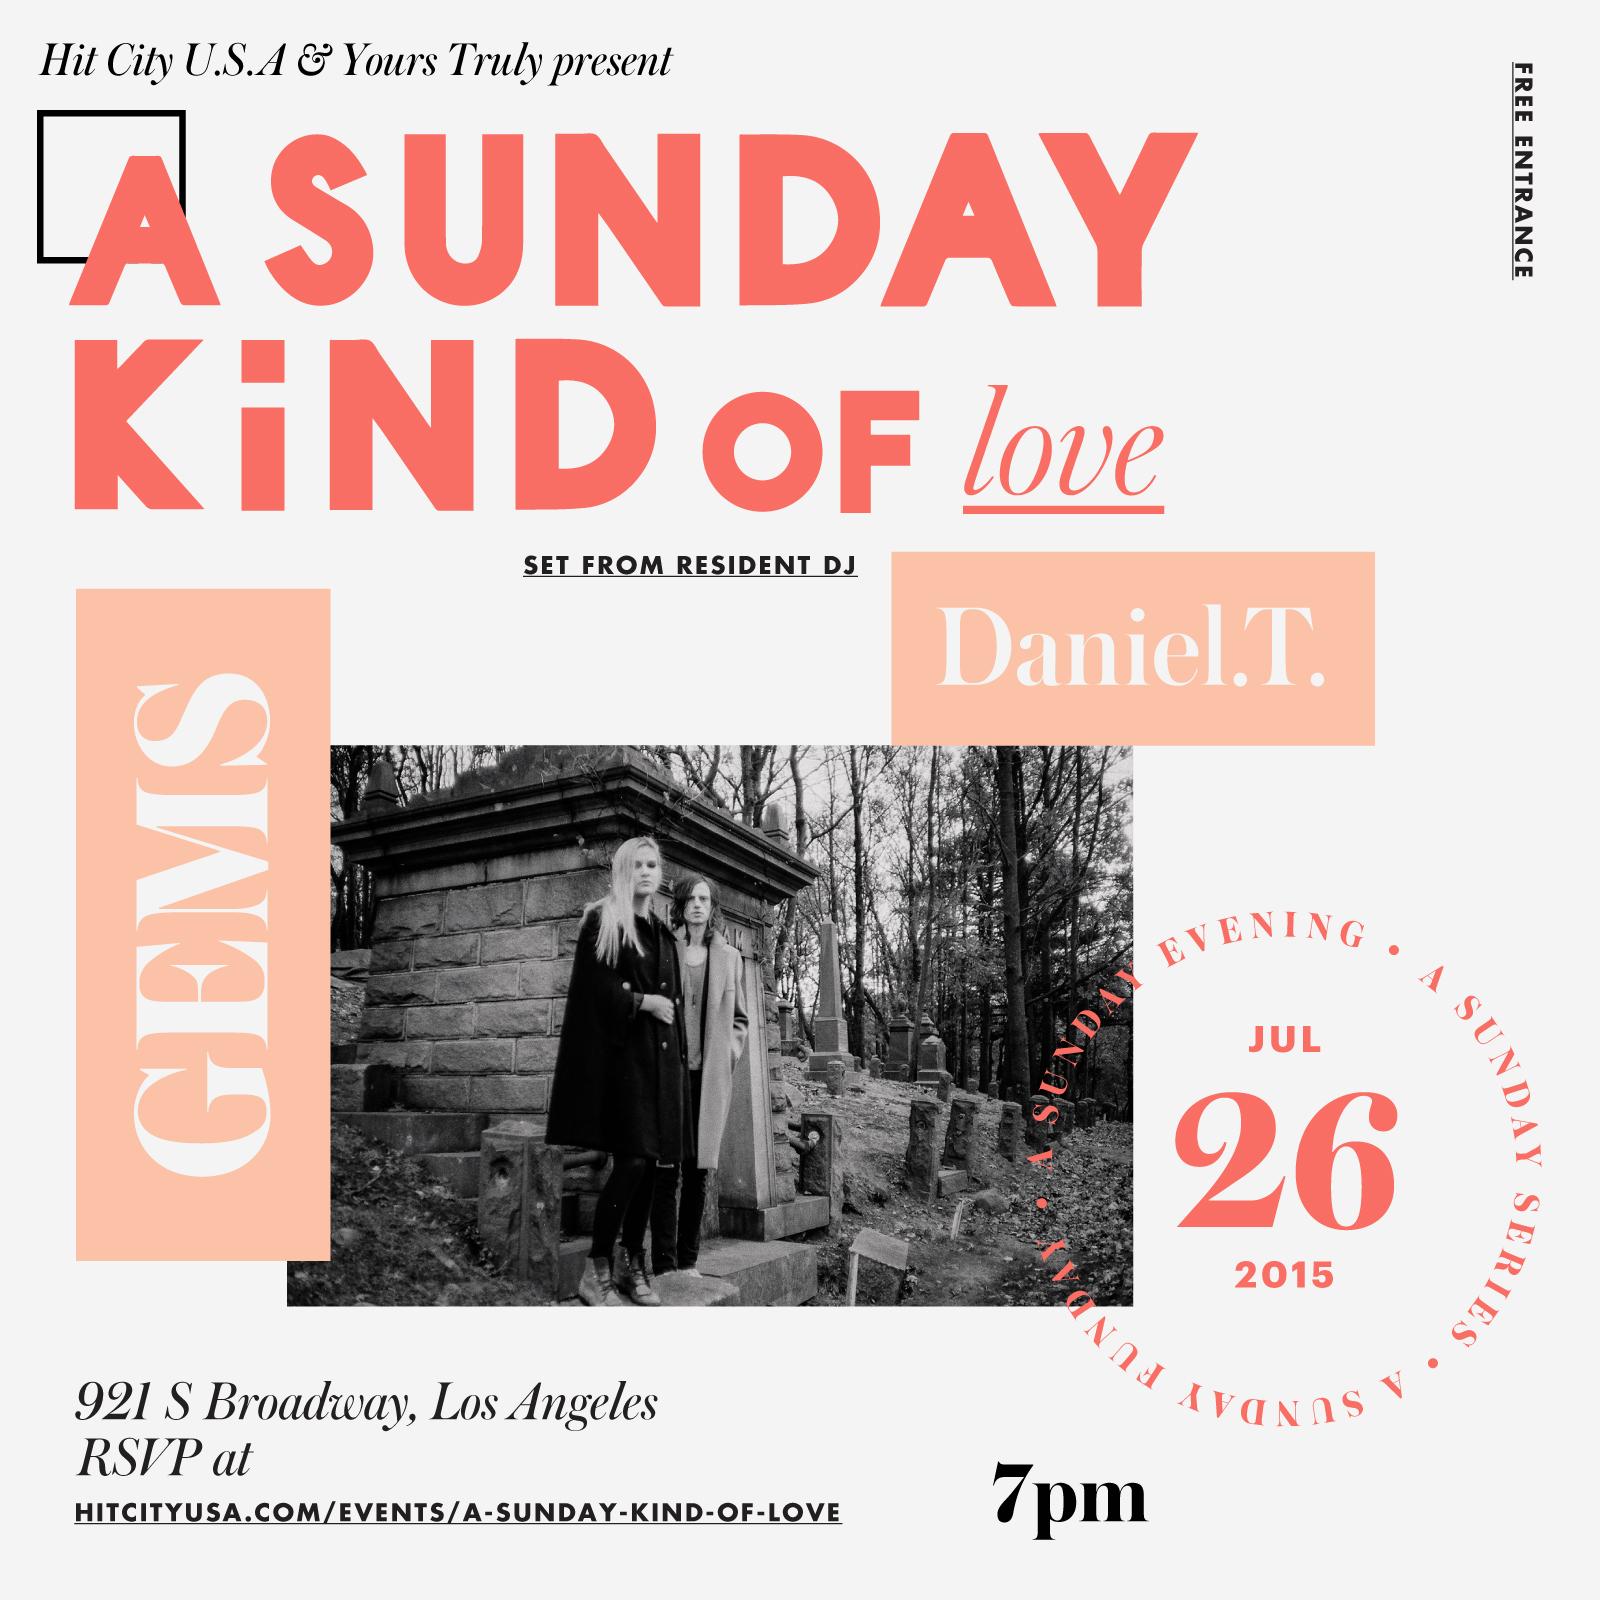 A Sunday Kind of Love With GEMS